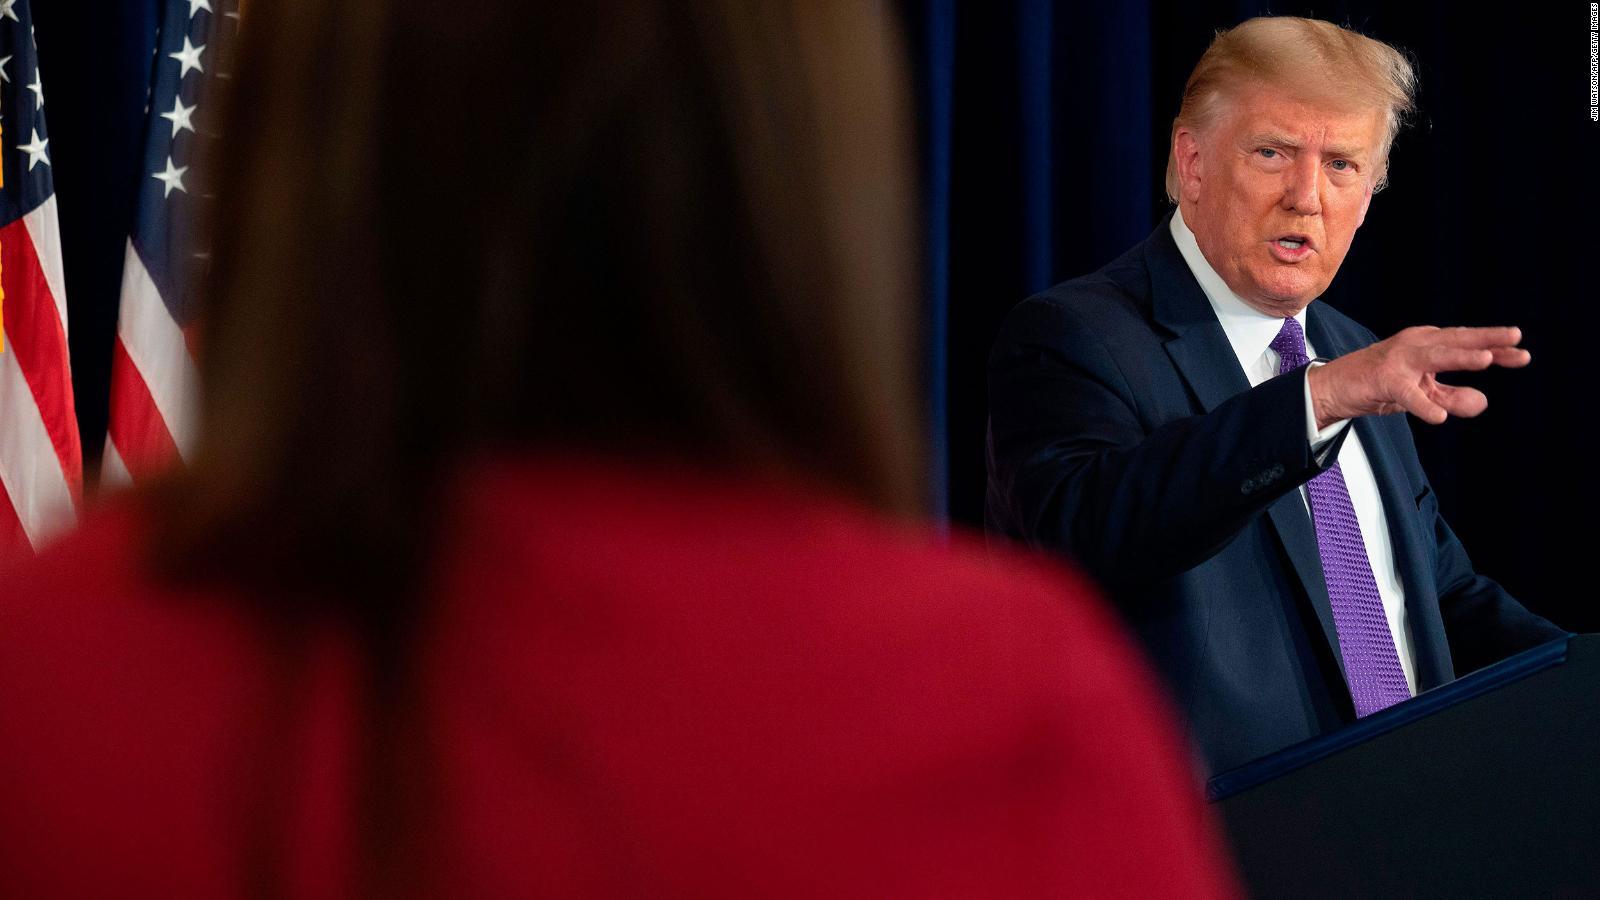 Trump Enthusiastic Over Unproven Coronavirus Therapeutic Mypillow Creator Says Cnnpolitics